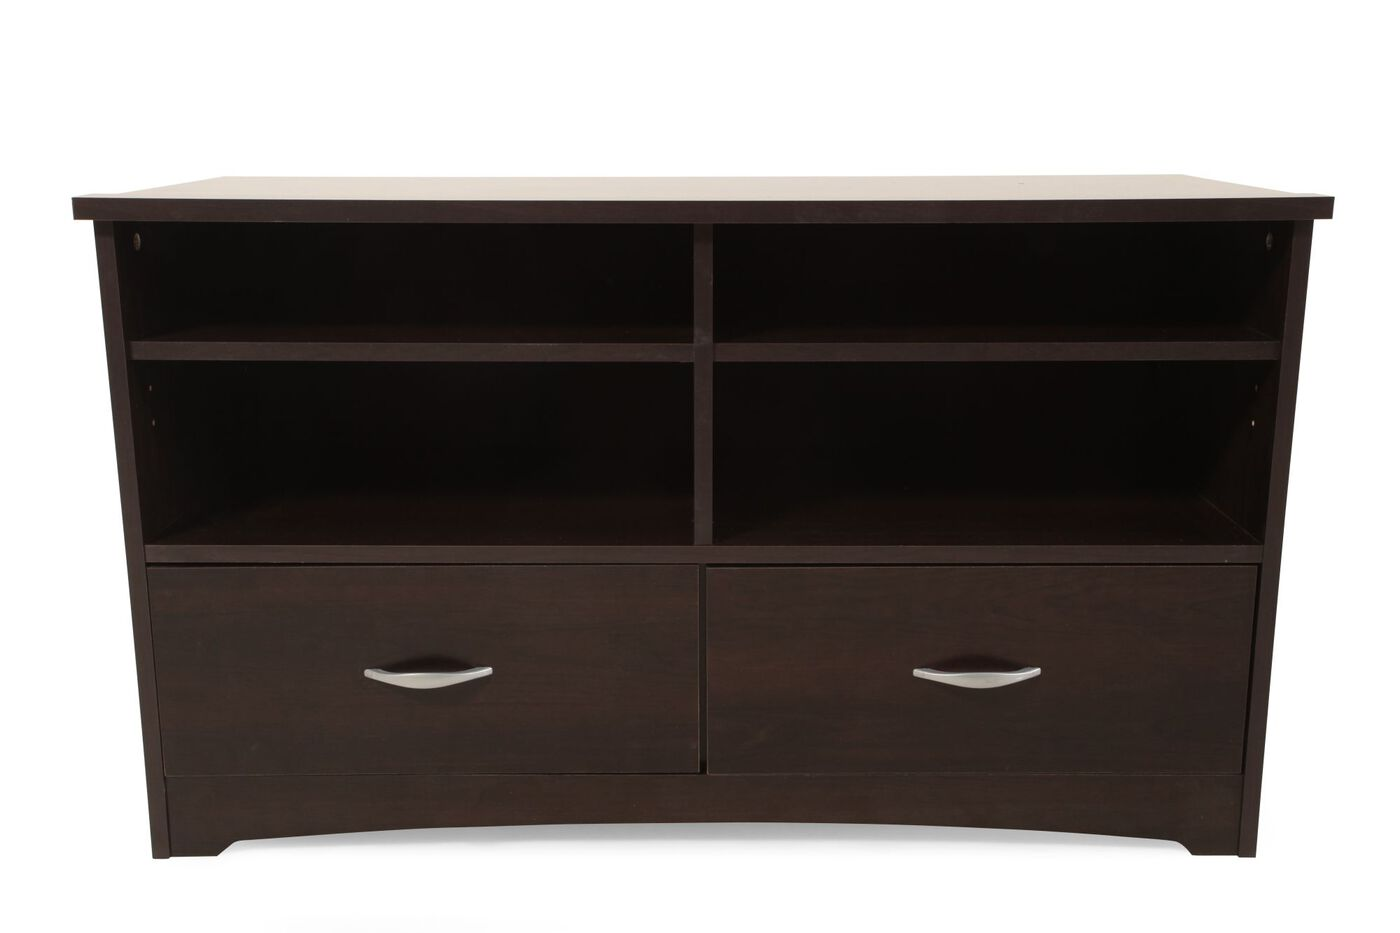 Sauder Tv Cabinet Sauder Beginnings Cinnamon Cherry Tv Stand Mathis Brothers Furniture